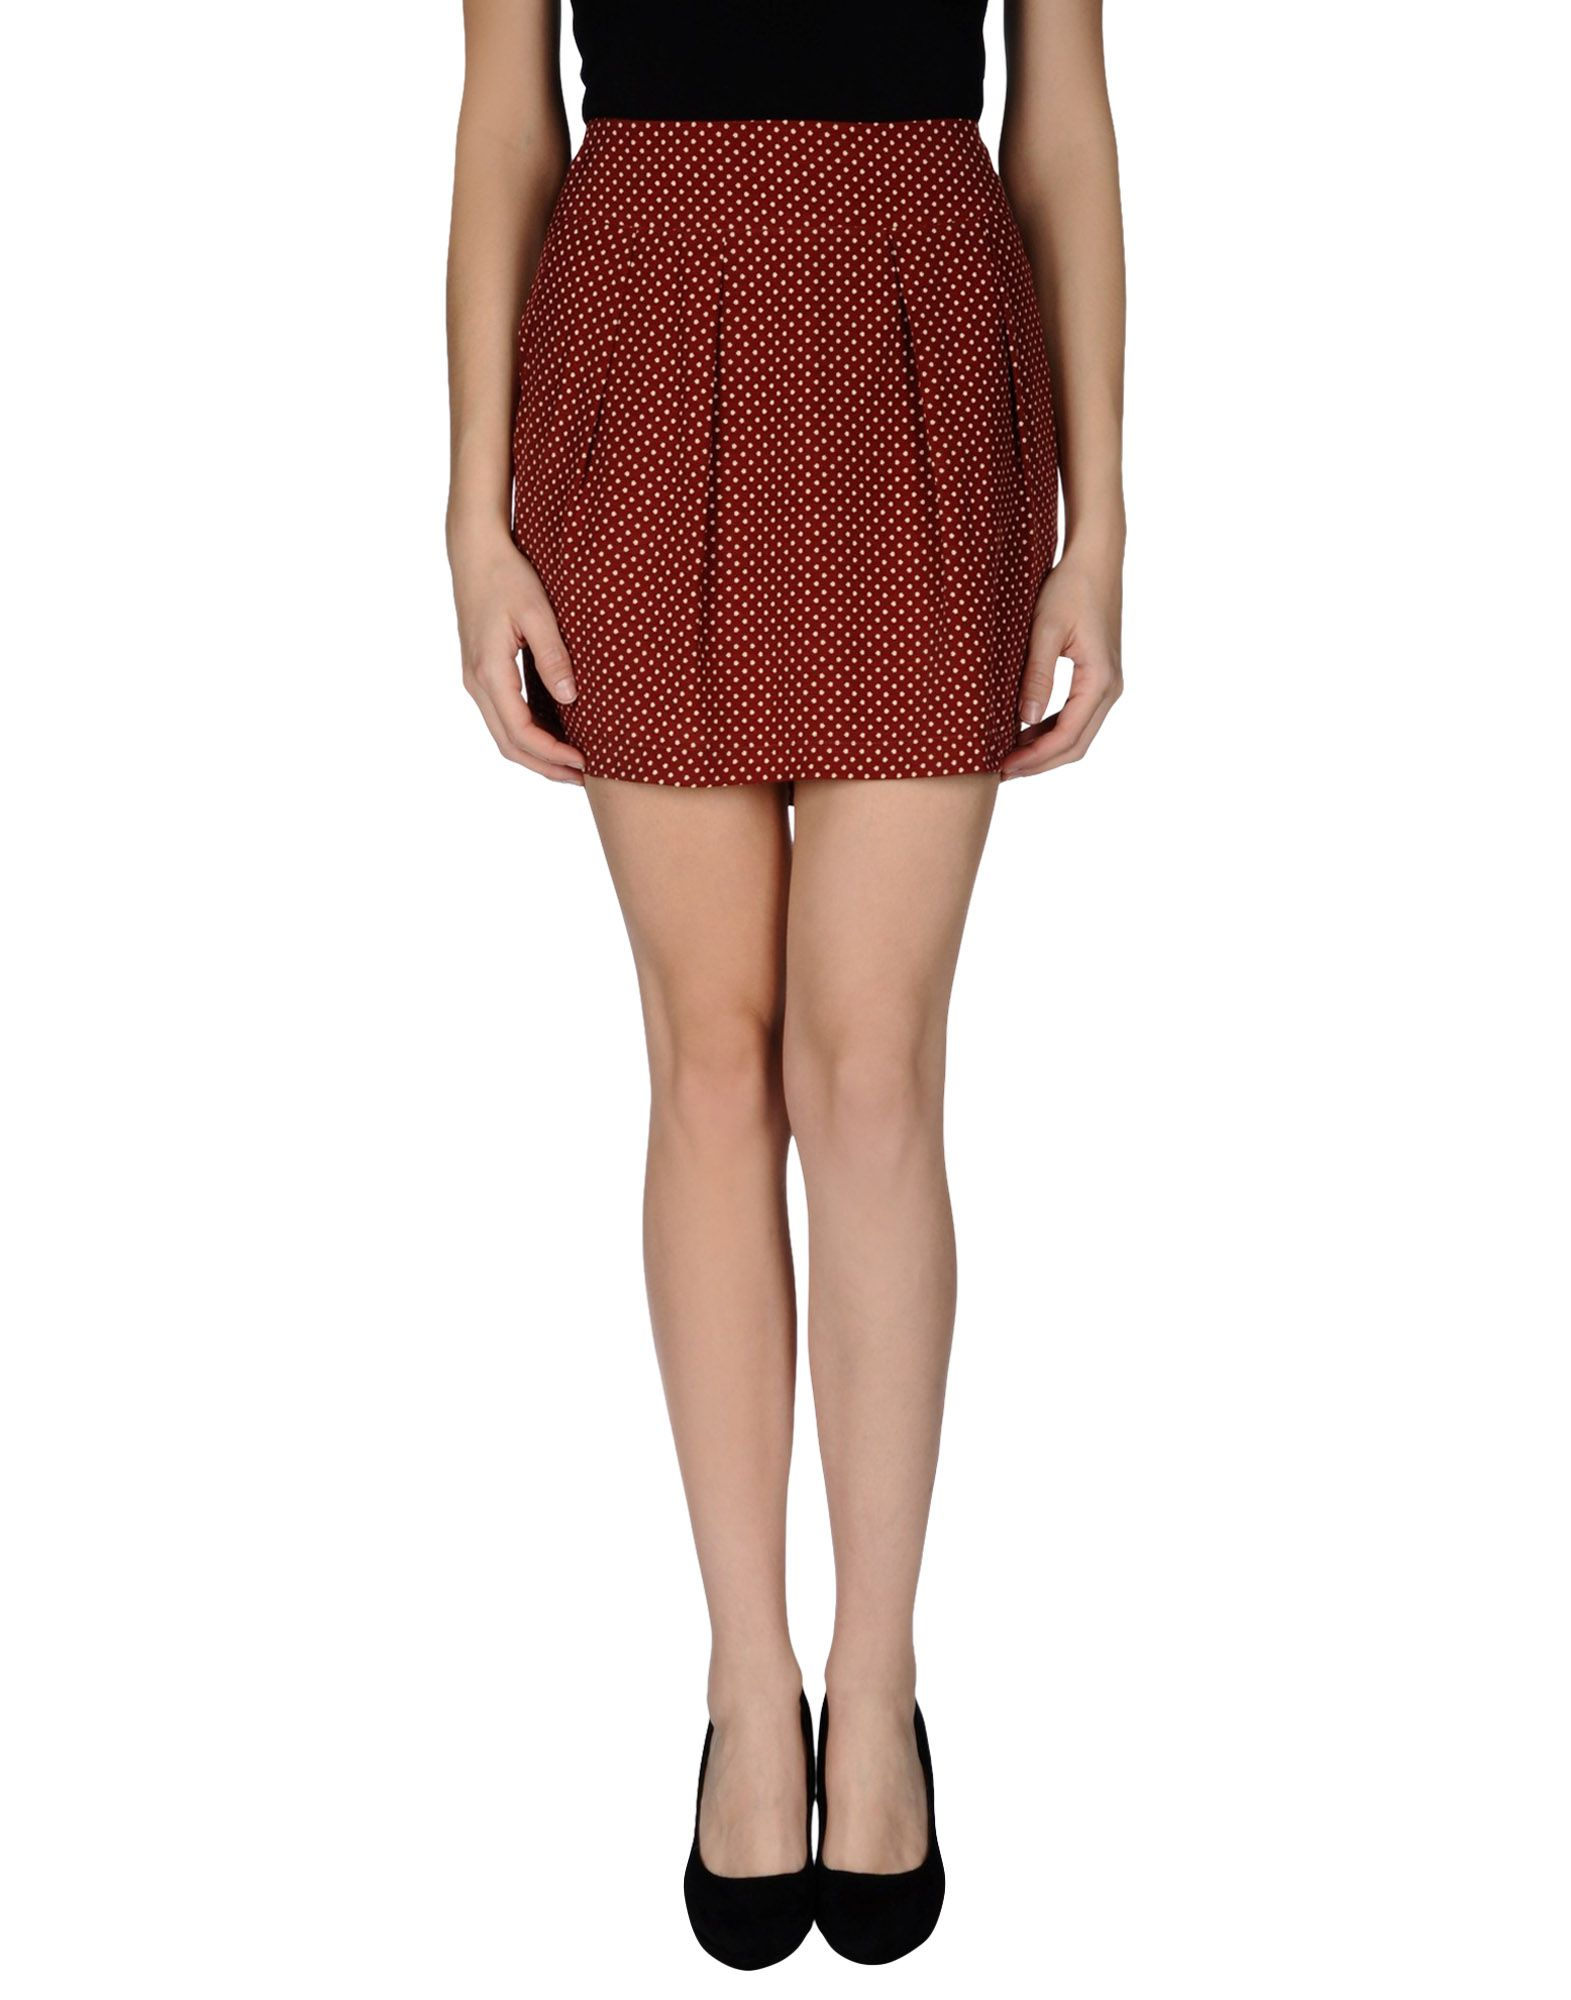 Aniye By Mini Skirt - Women Aniye By Mini Skirts online on YOOX United States